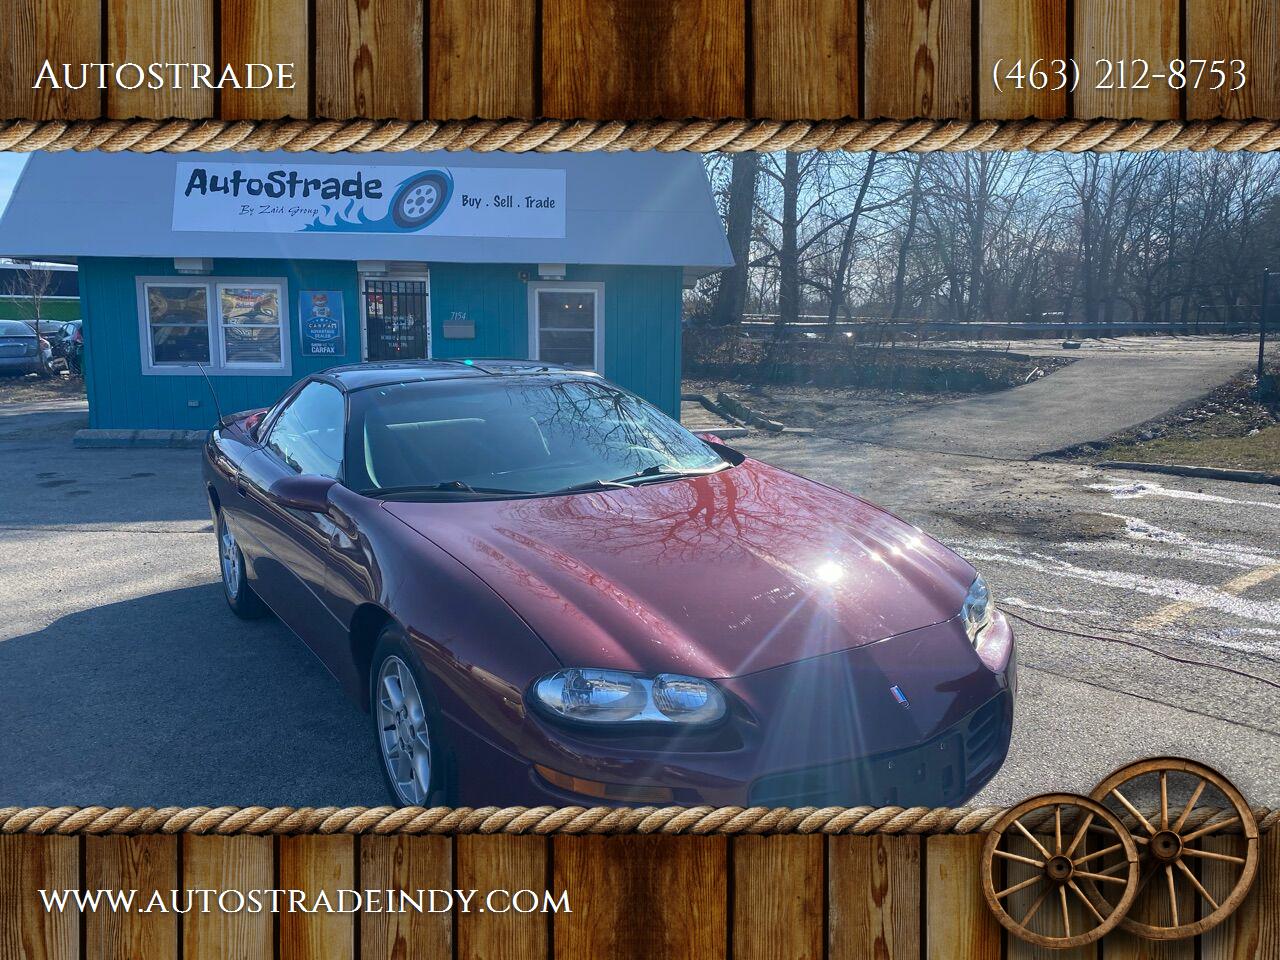 2001 Chevrolet Camaro Coupe RWD